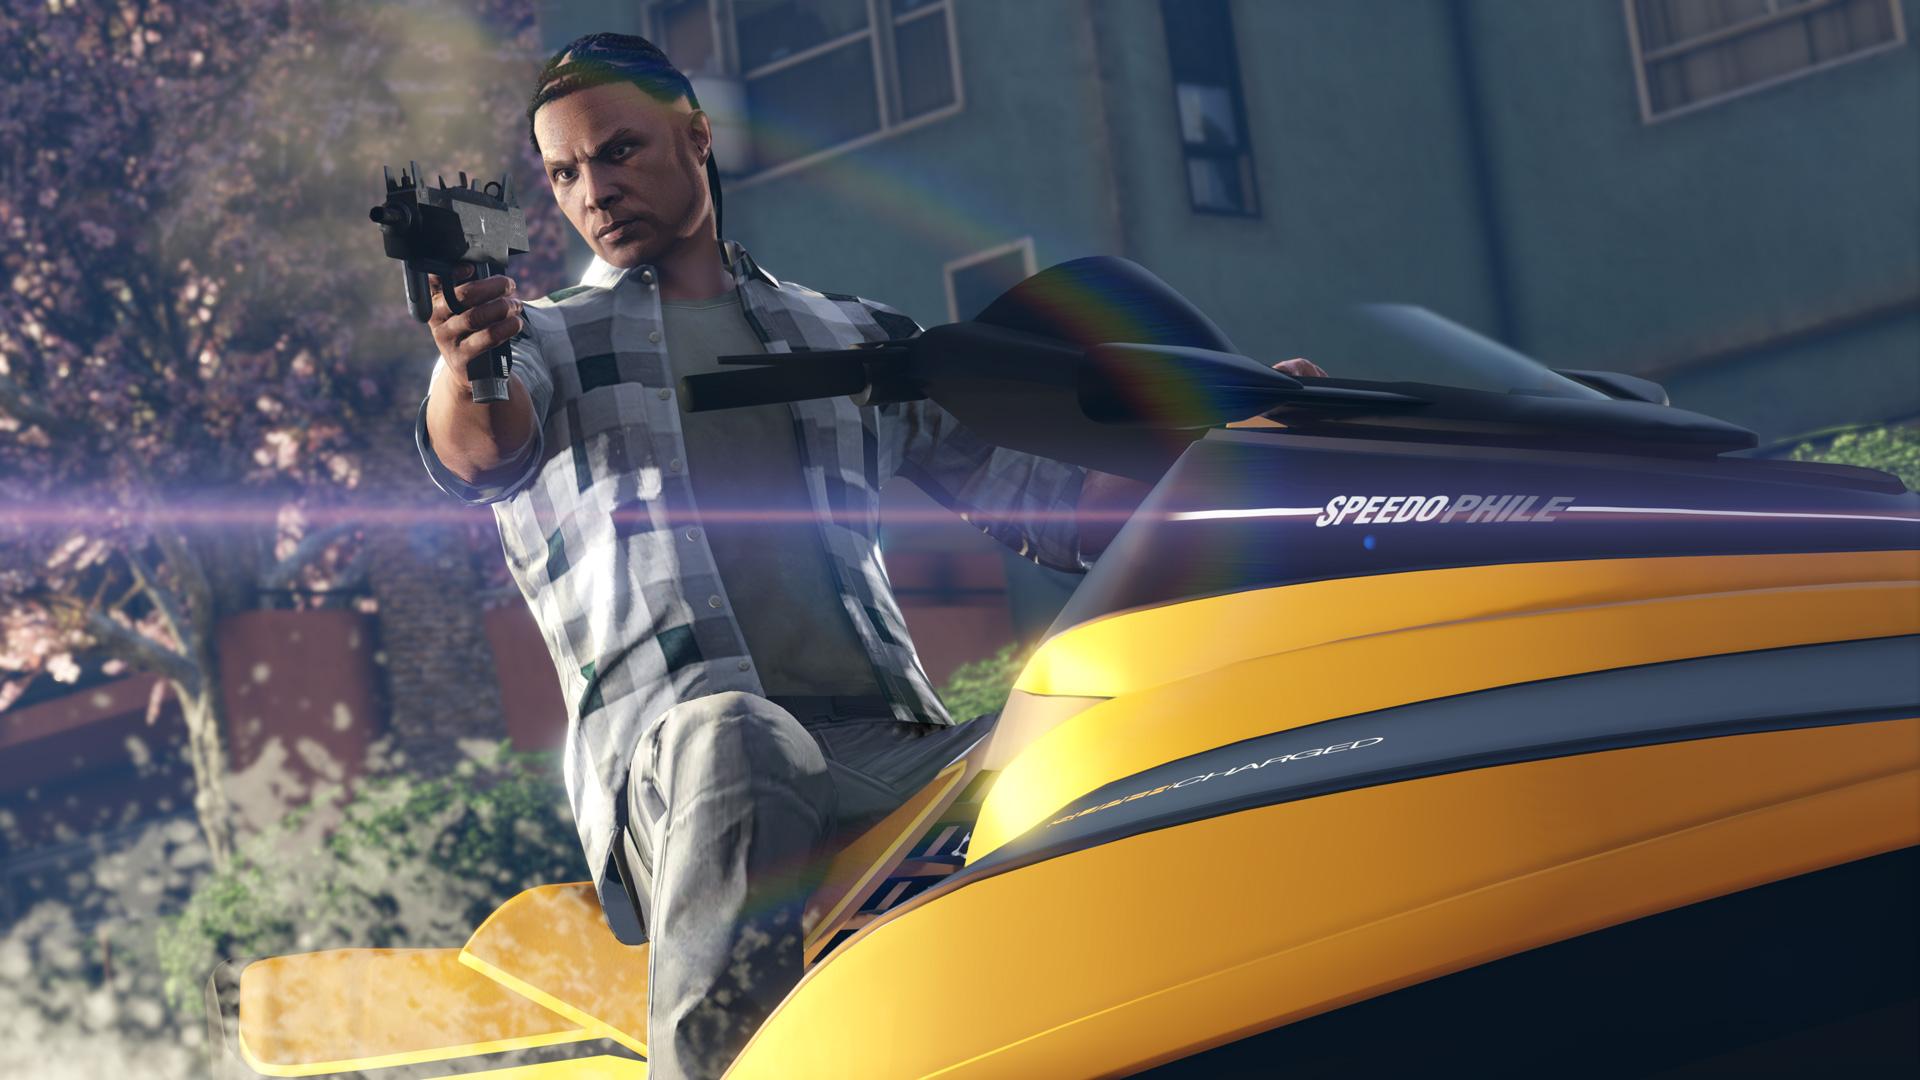 GTA Online player shoots gun on jet ski